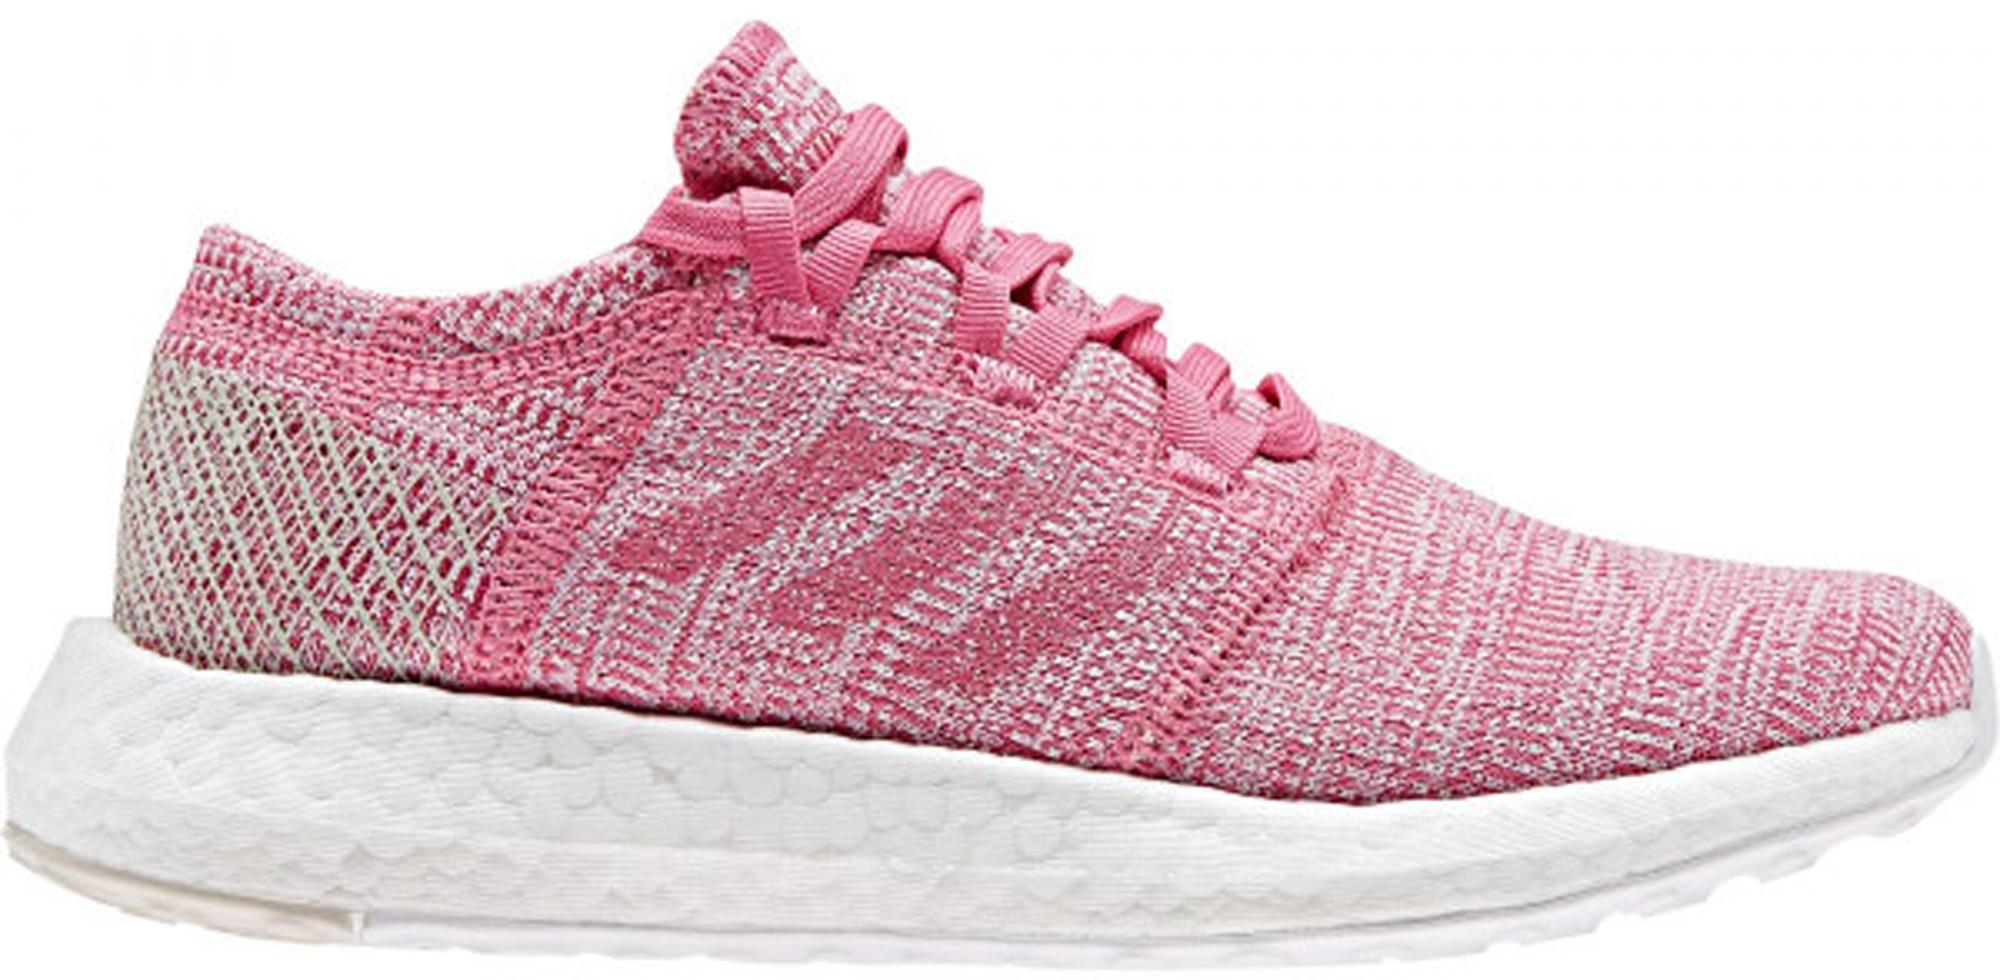 adidas Pureboost Go Semi Solar Pink